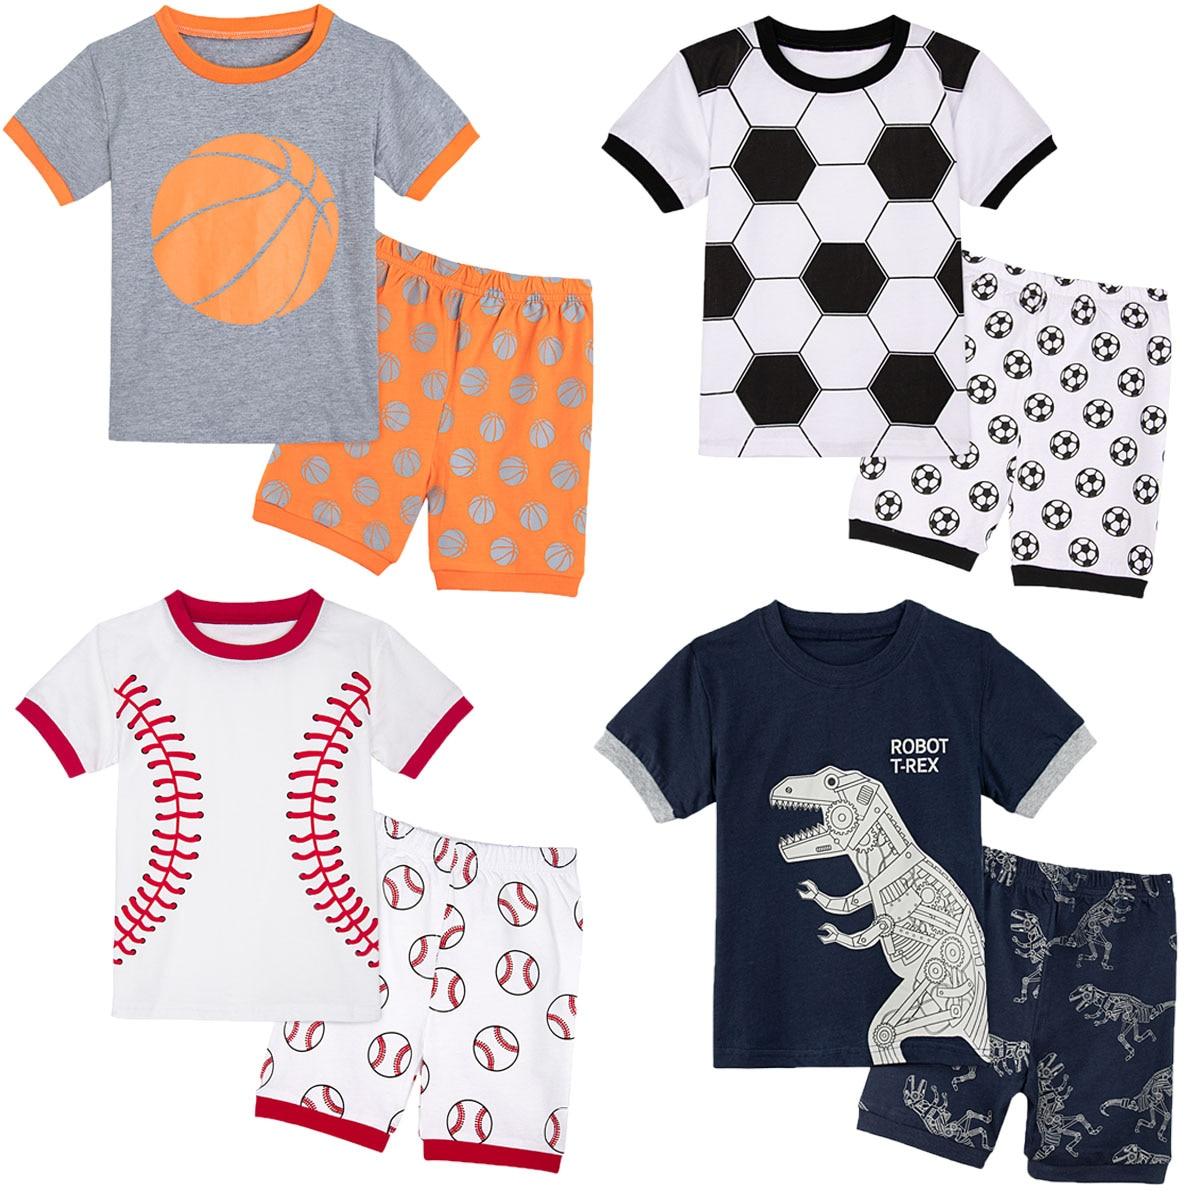 Kids Boys Robot T-rex Dinosaur Football Baseball Basketball Pyjamas Set Toddler Soccer Pajamas Children Print Nightie 2PCS